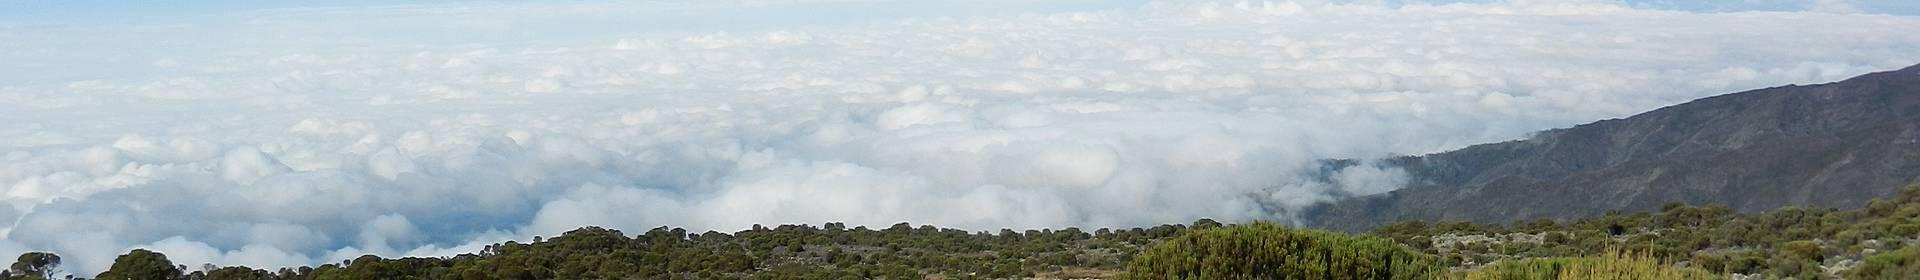 Shira Plateau